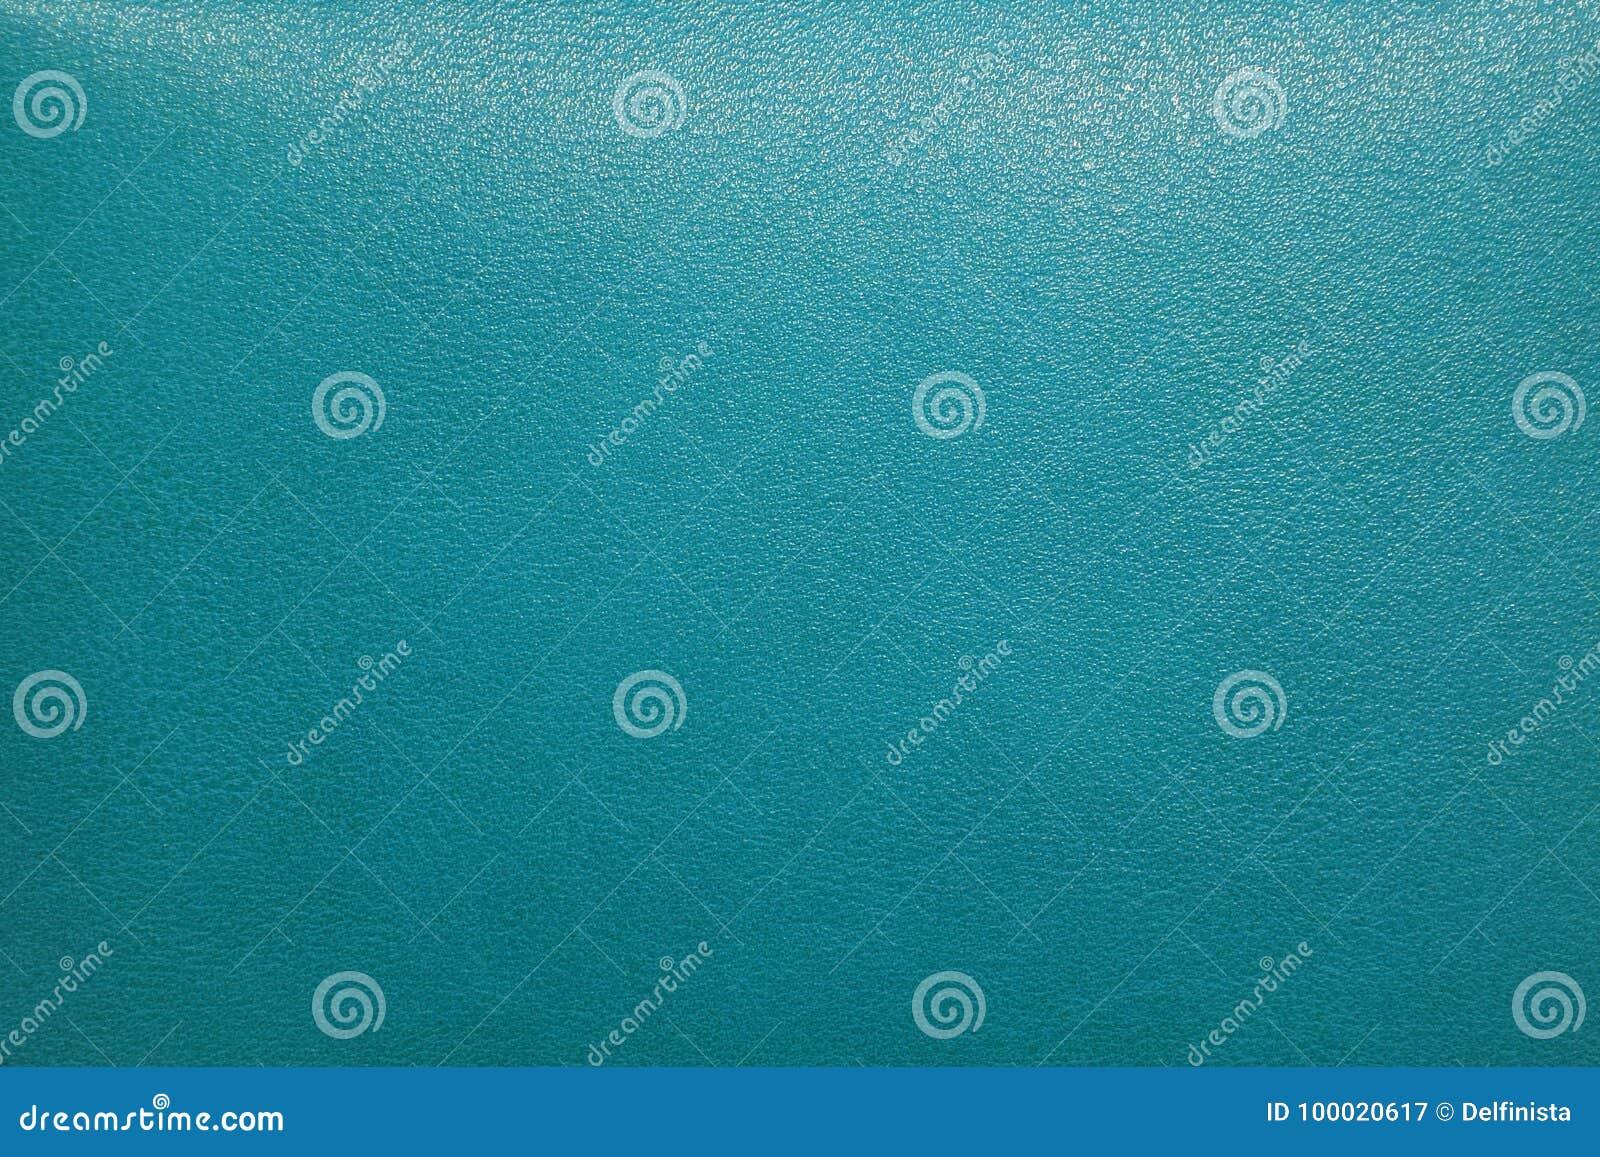 Turquoise Leather Background - Stock Photos